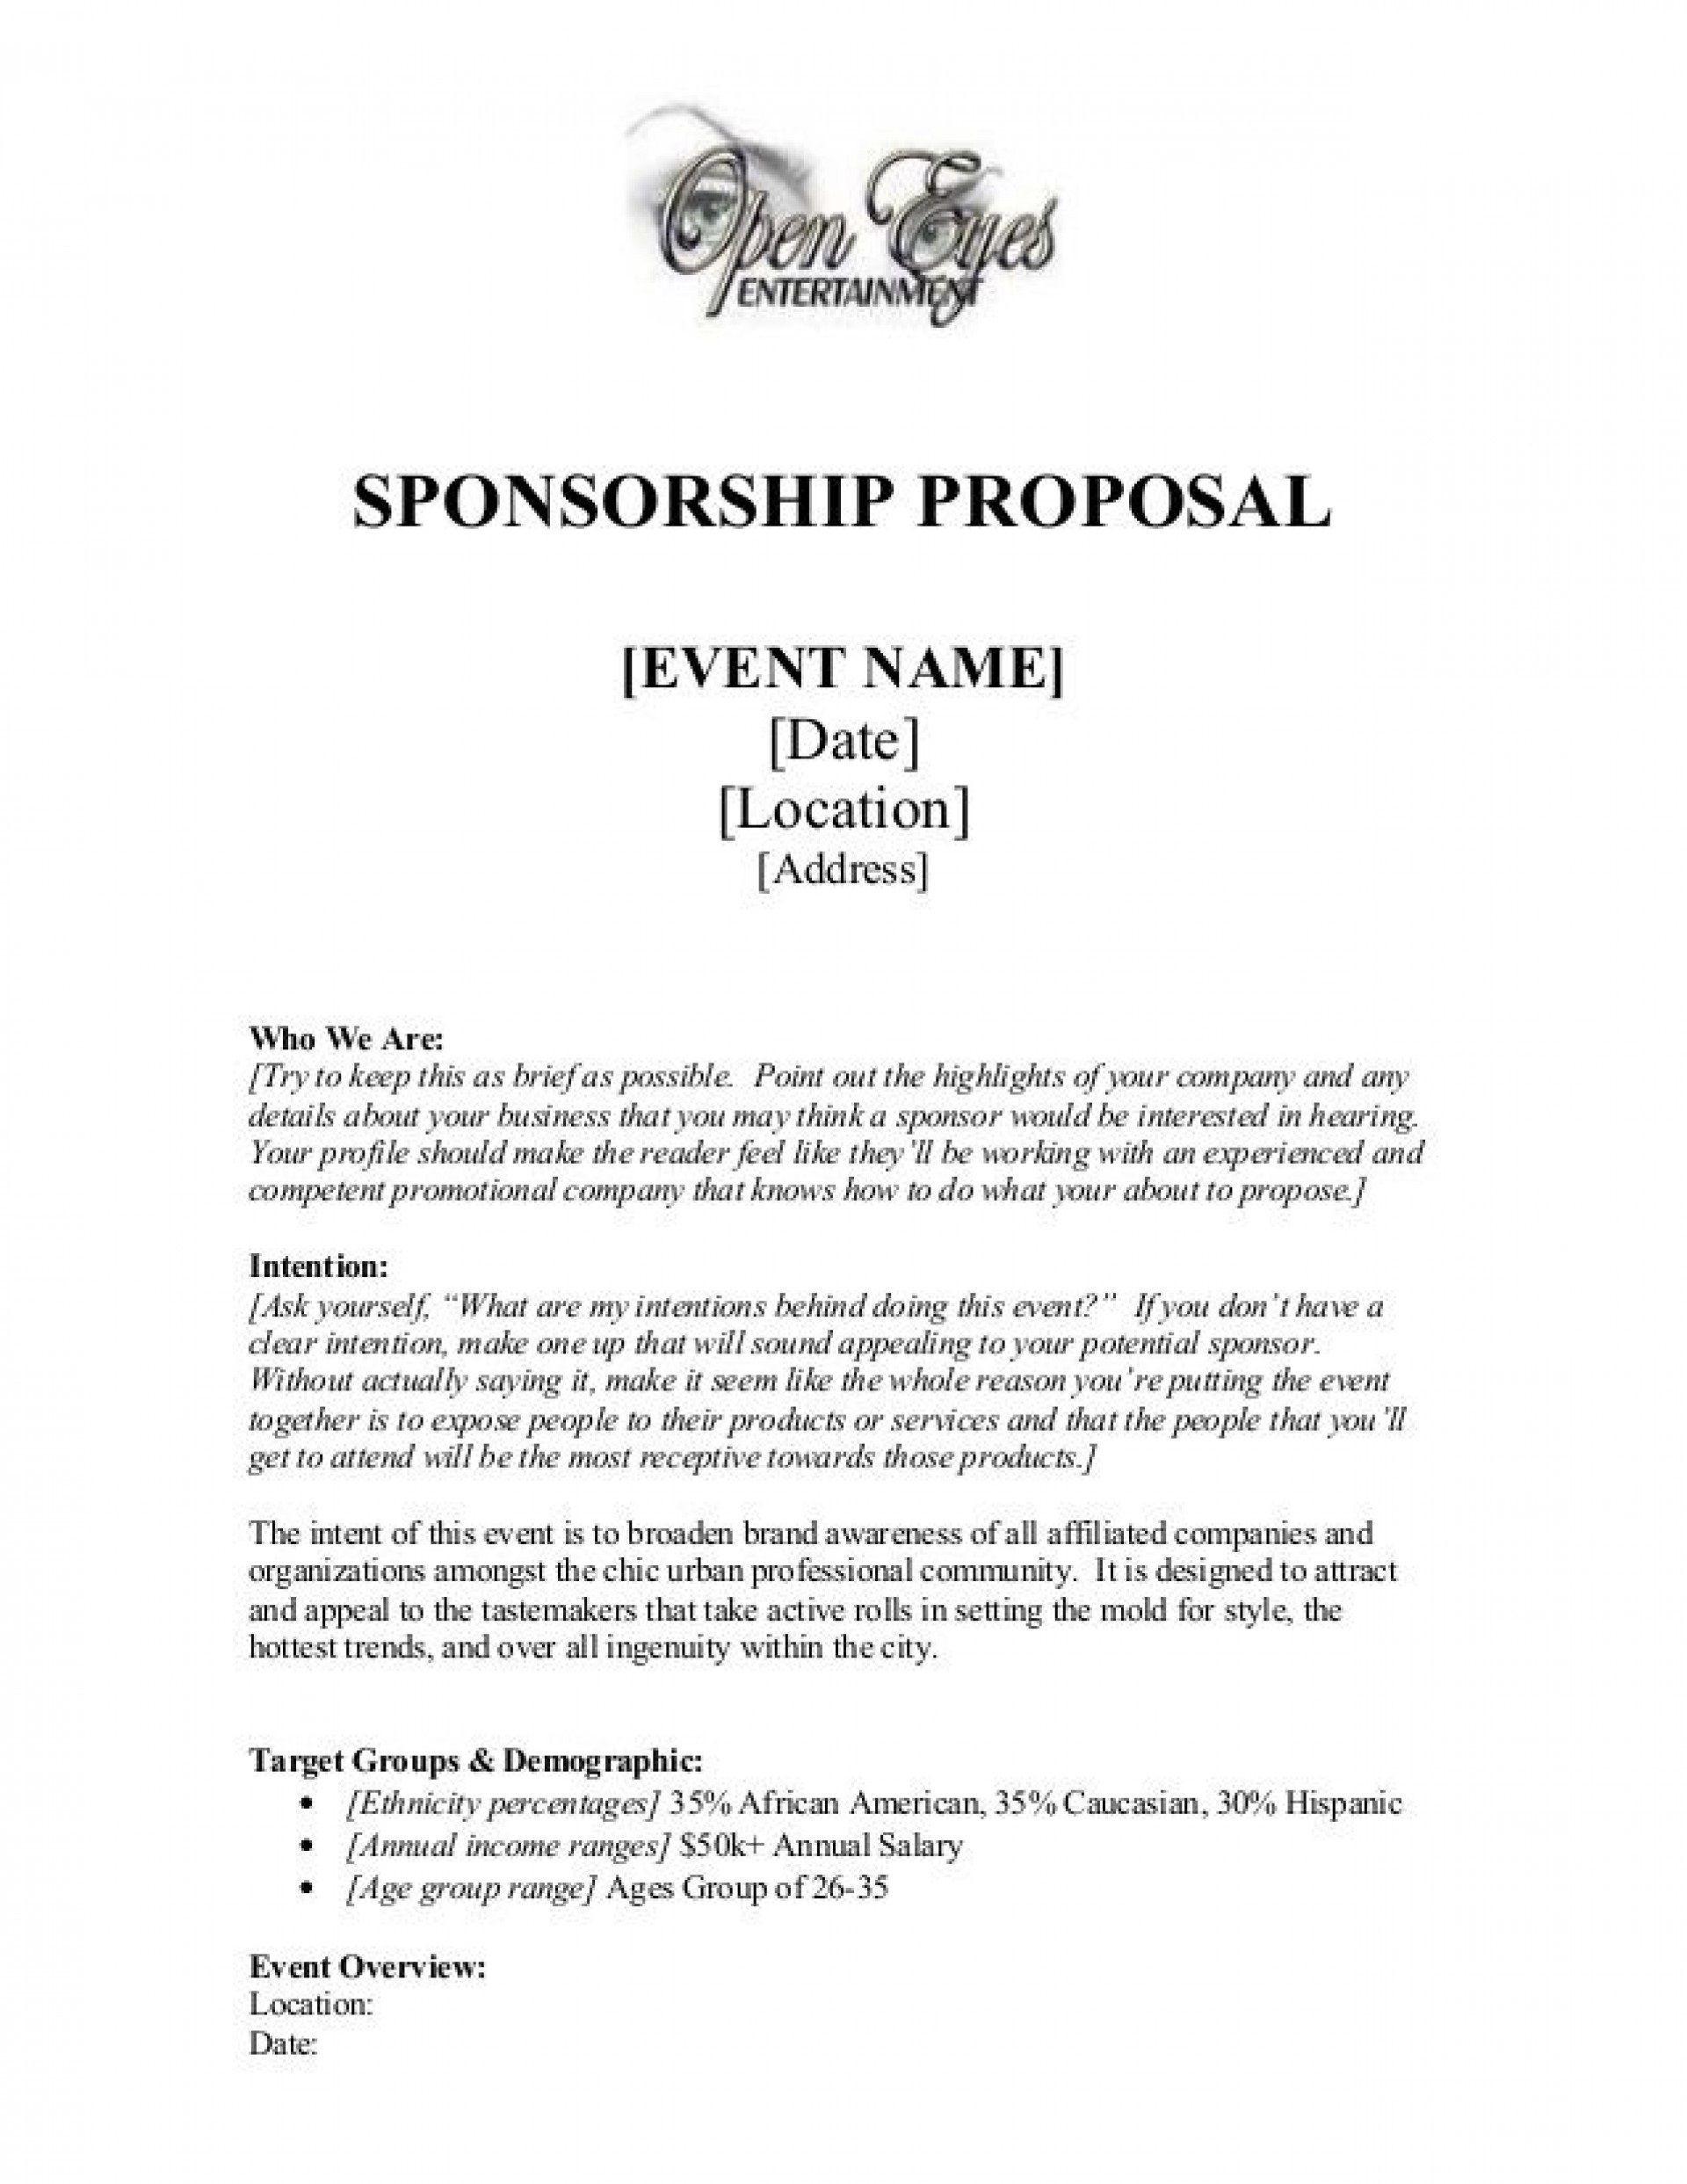 004 Remarkable Event Sponsorship Proposal Sample Pdf High Def  For Letter Music Template1920